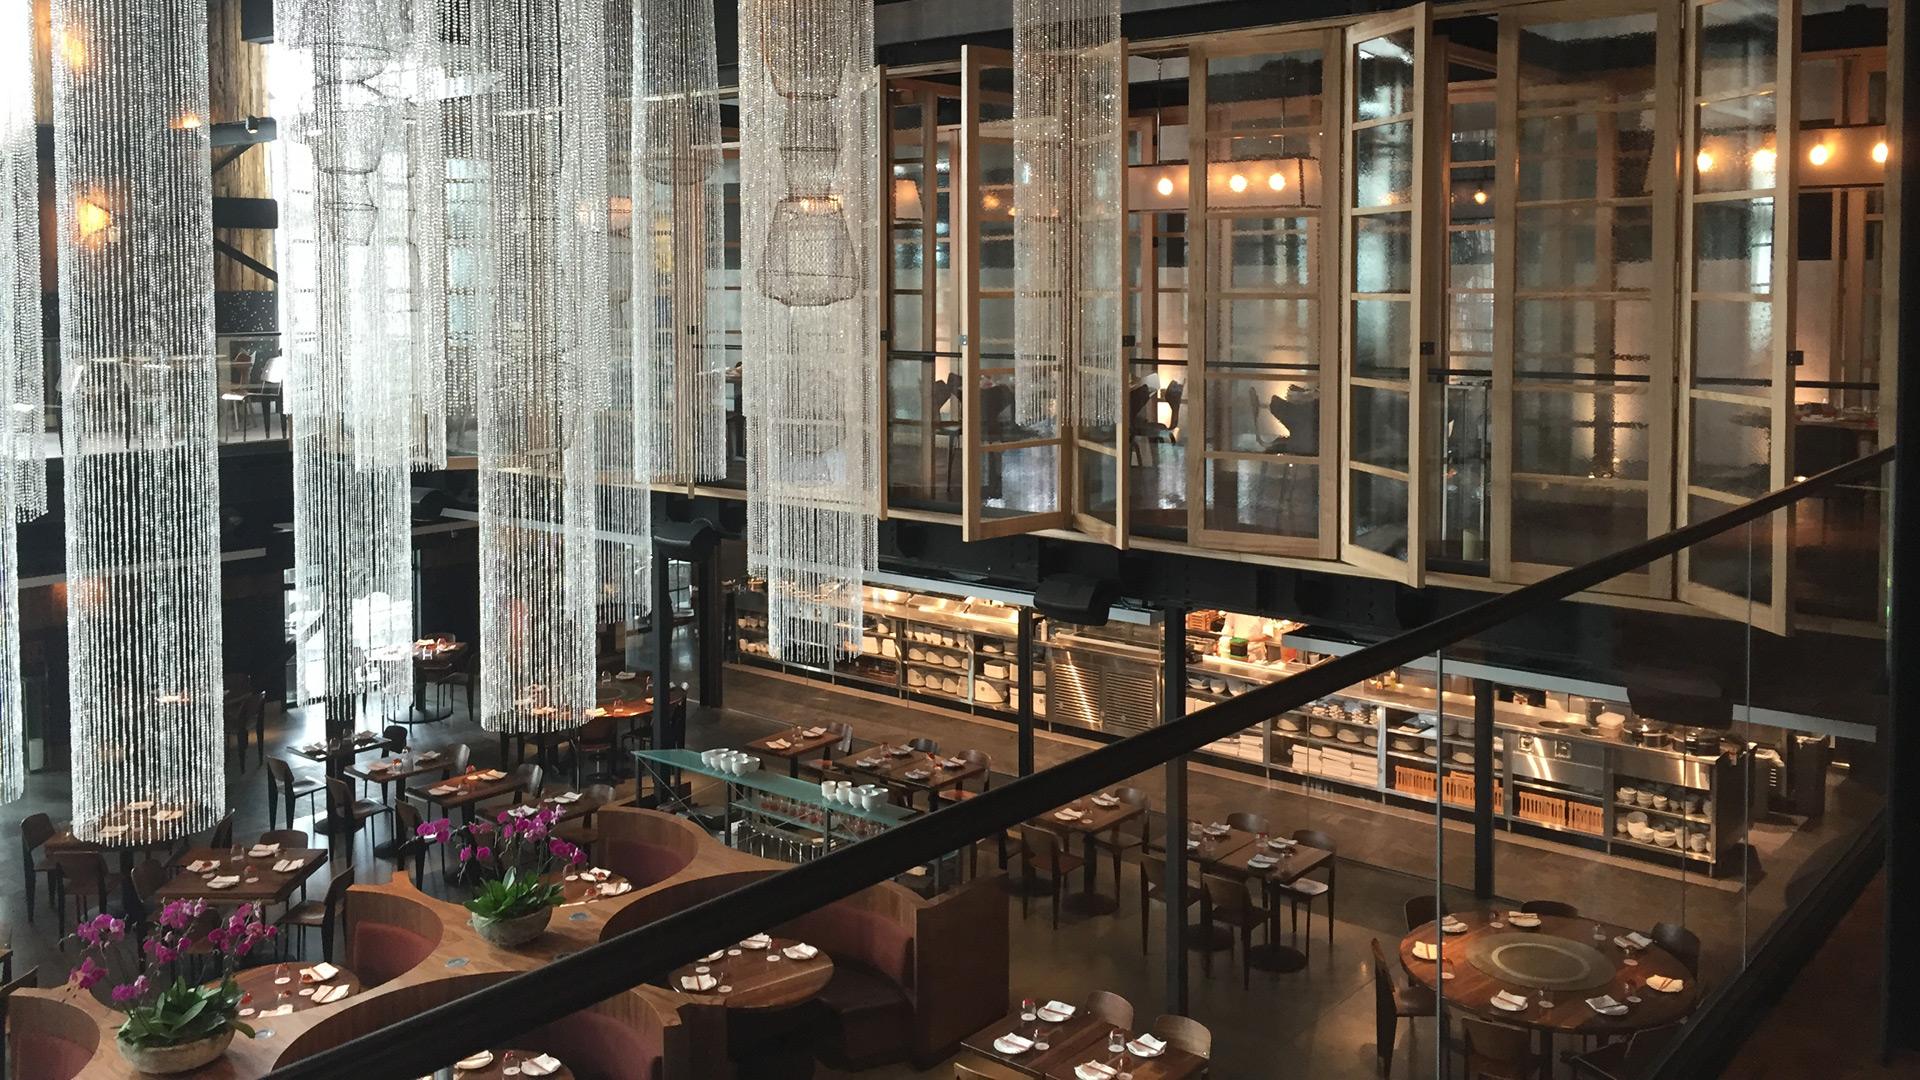 Morimoto Asia in Disney Springs for Chef Masaharu Morimoto, Patina Restaurant Group and Delaware North